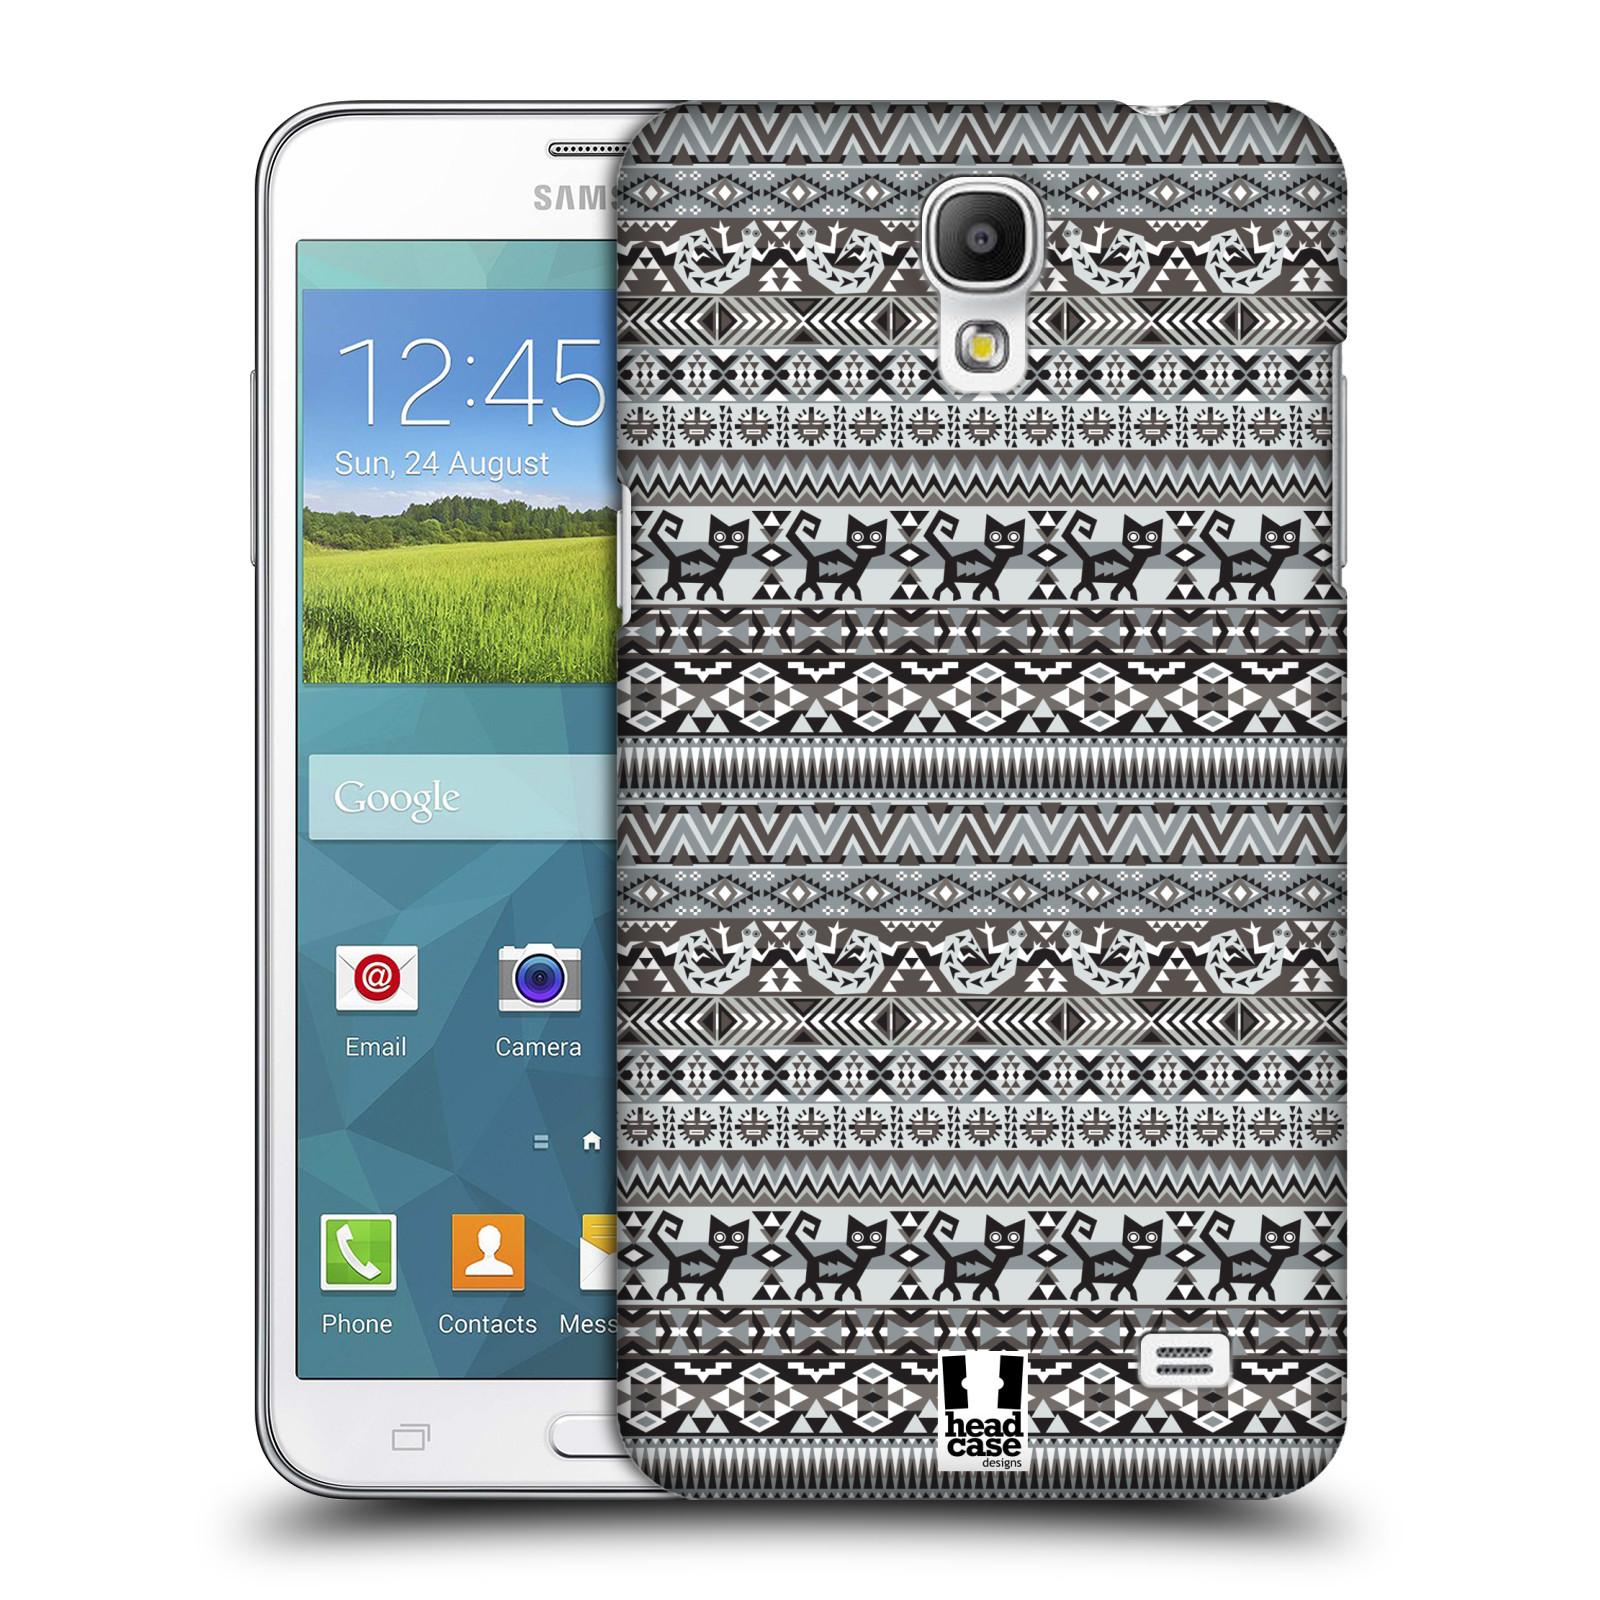 Samsung Galaxy Ace 2 I8160 Firmware